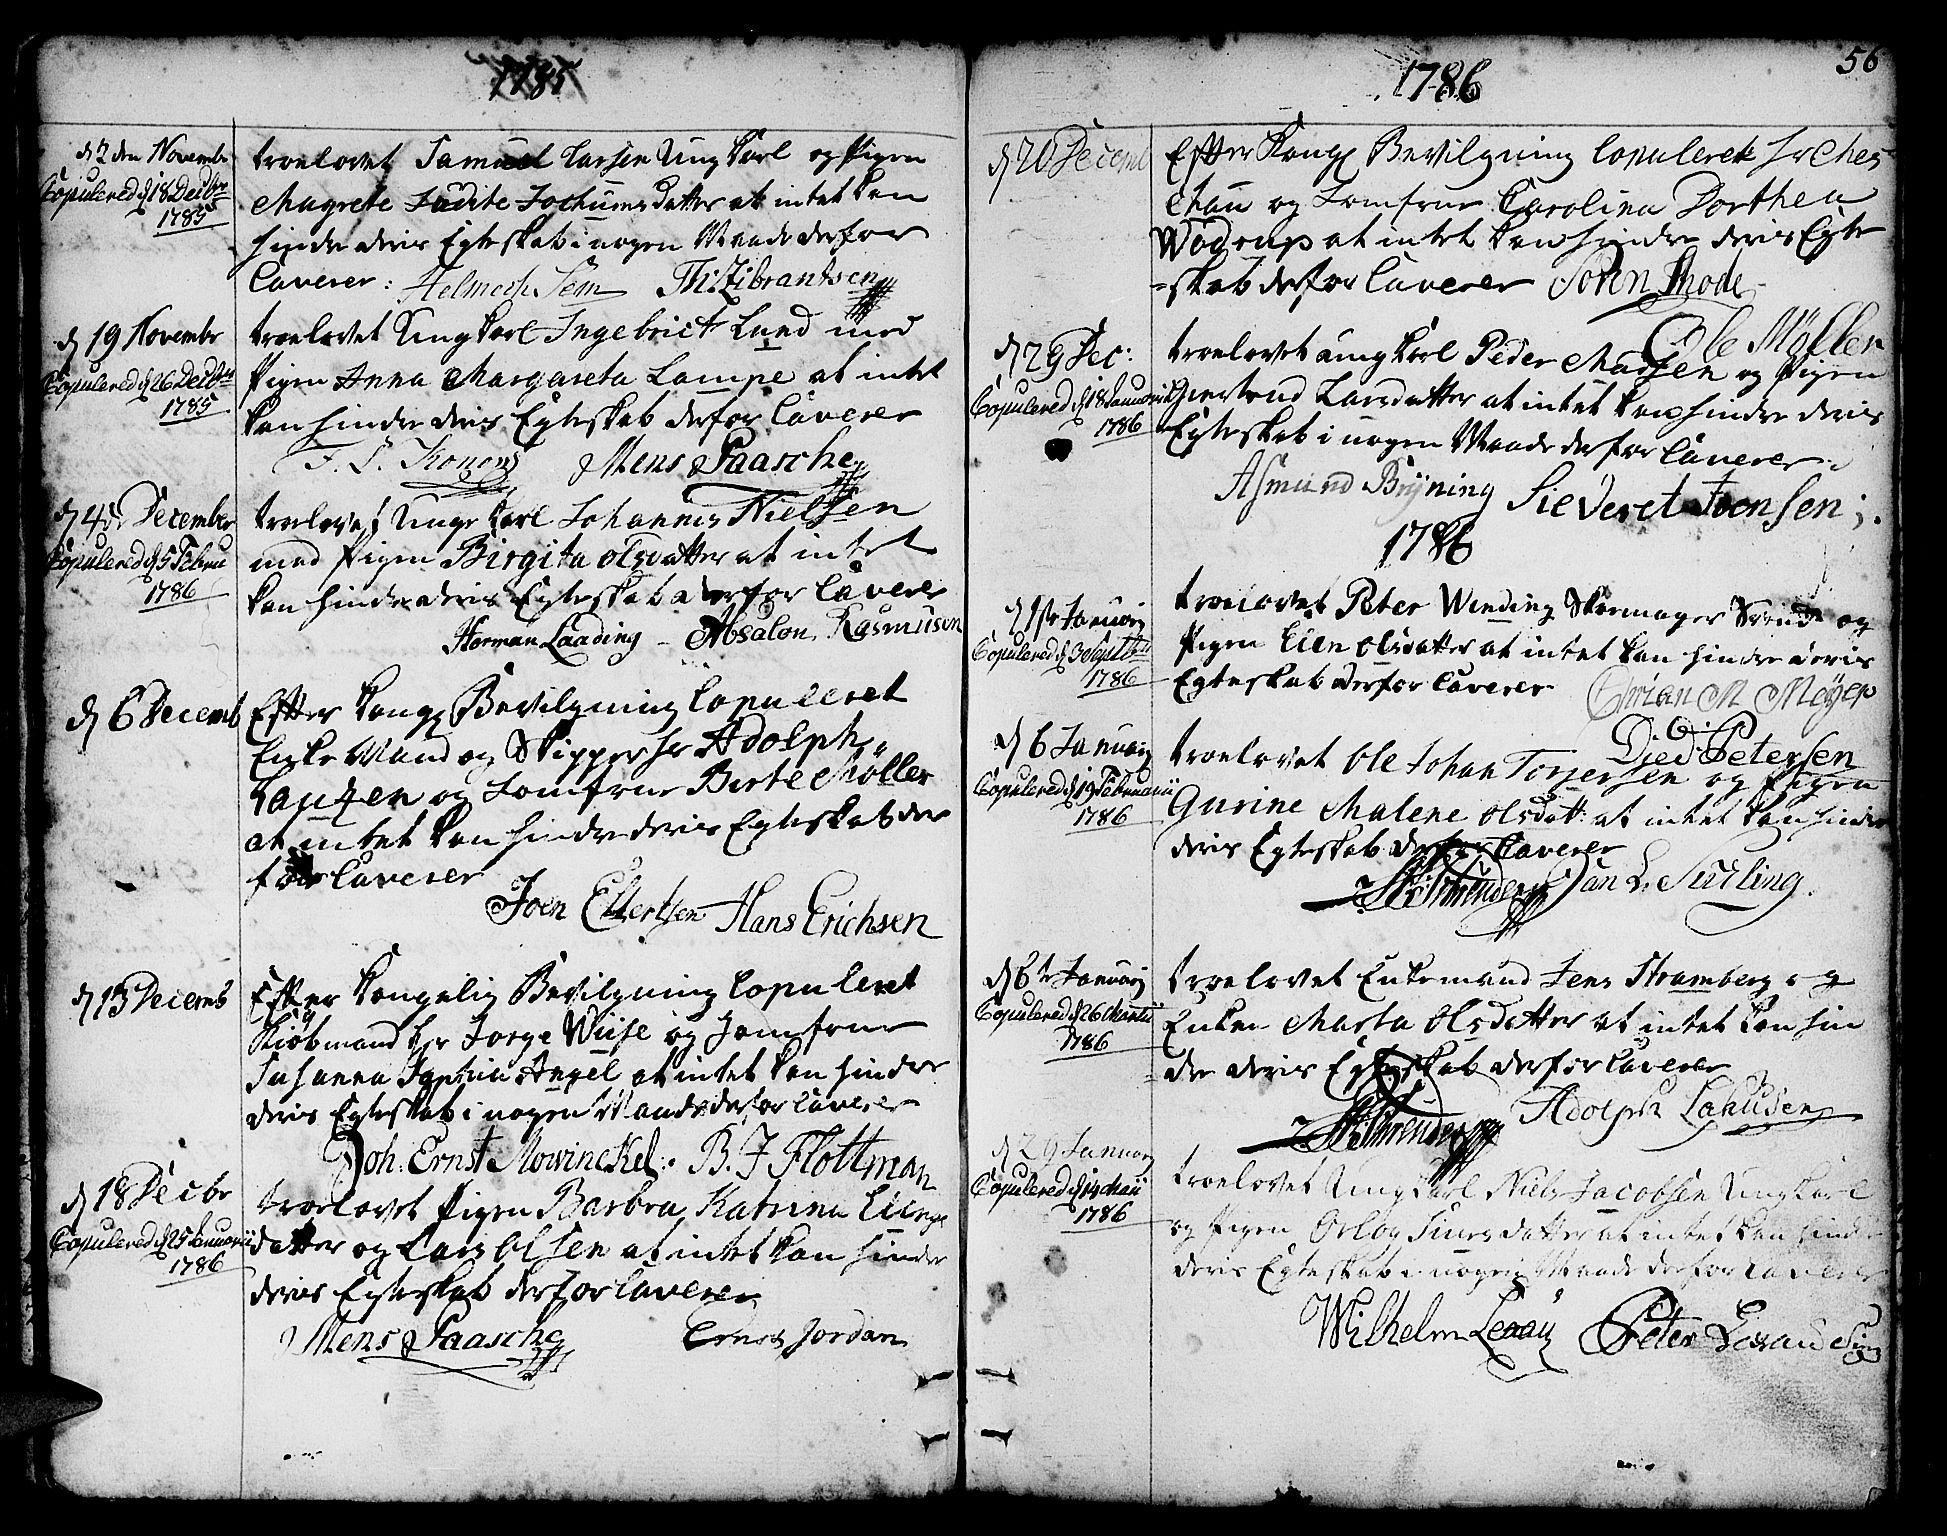 SAB, Nykirken Sokneprestembete, H/Haa: Ministerialbok nr. A 8, 1776-1814, s. 56